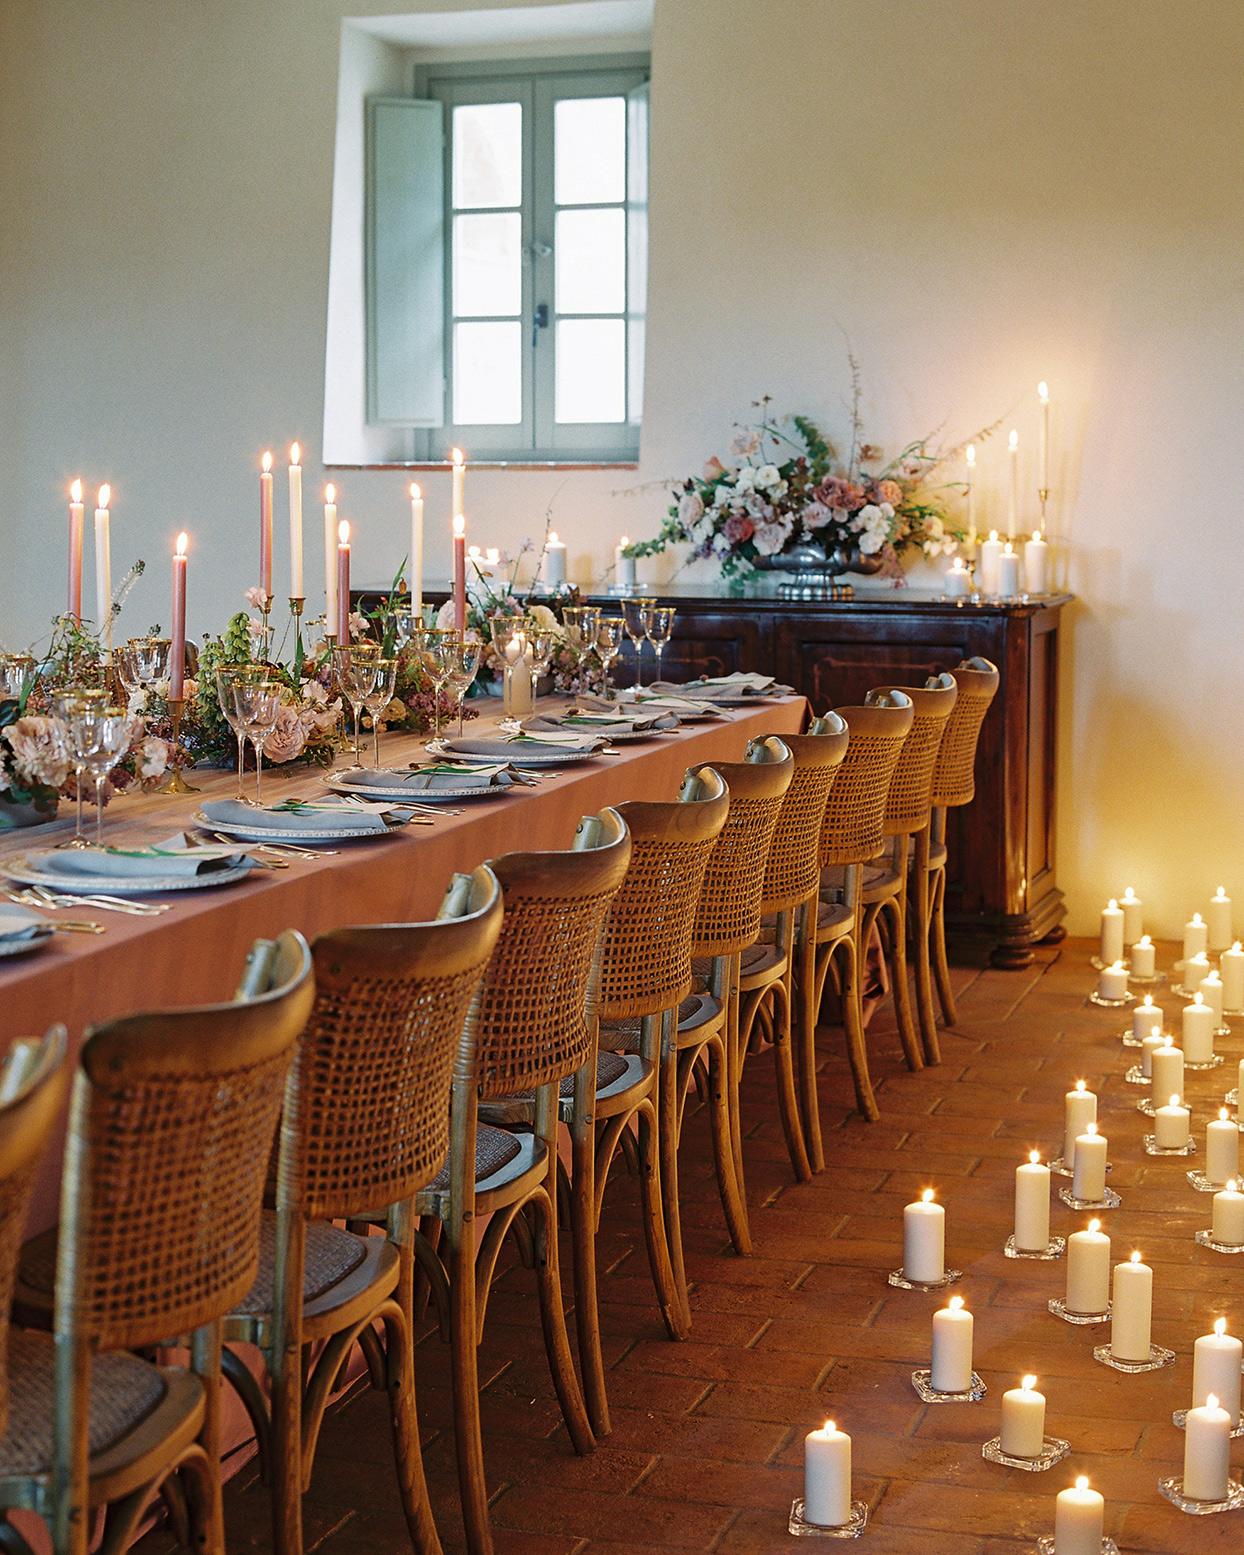 jen alan wedding reception candles on the floor